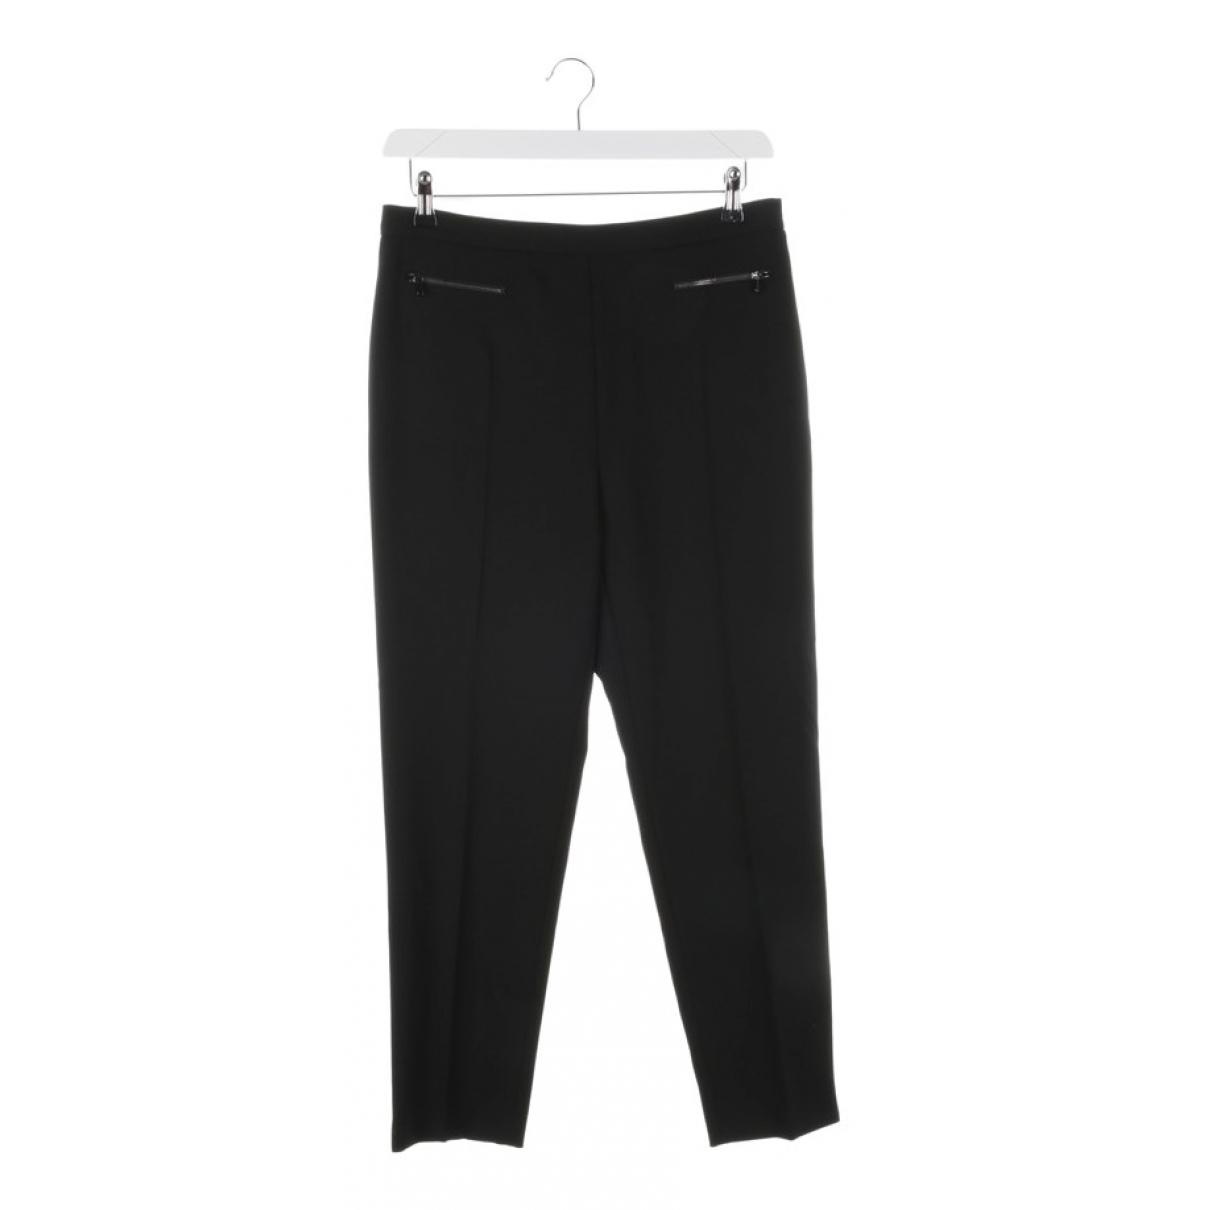 Max Mara \N Black Trousers for Women 42 FR